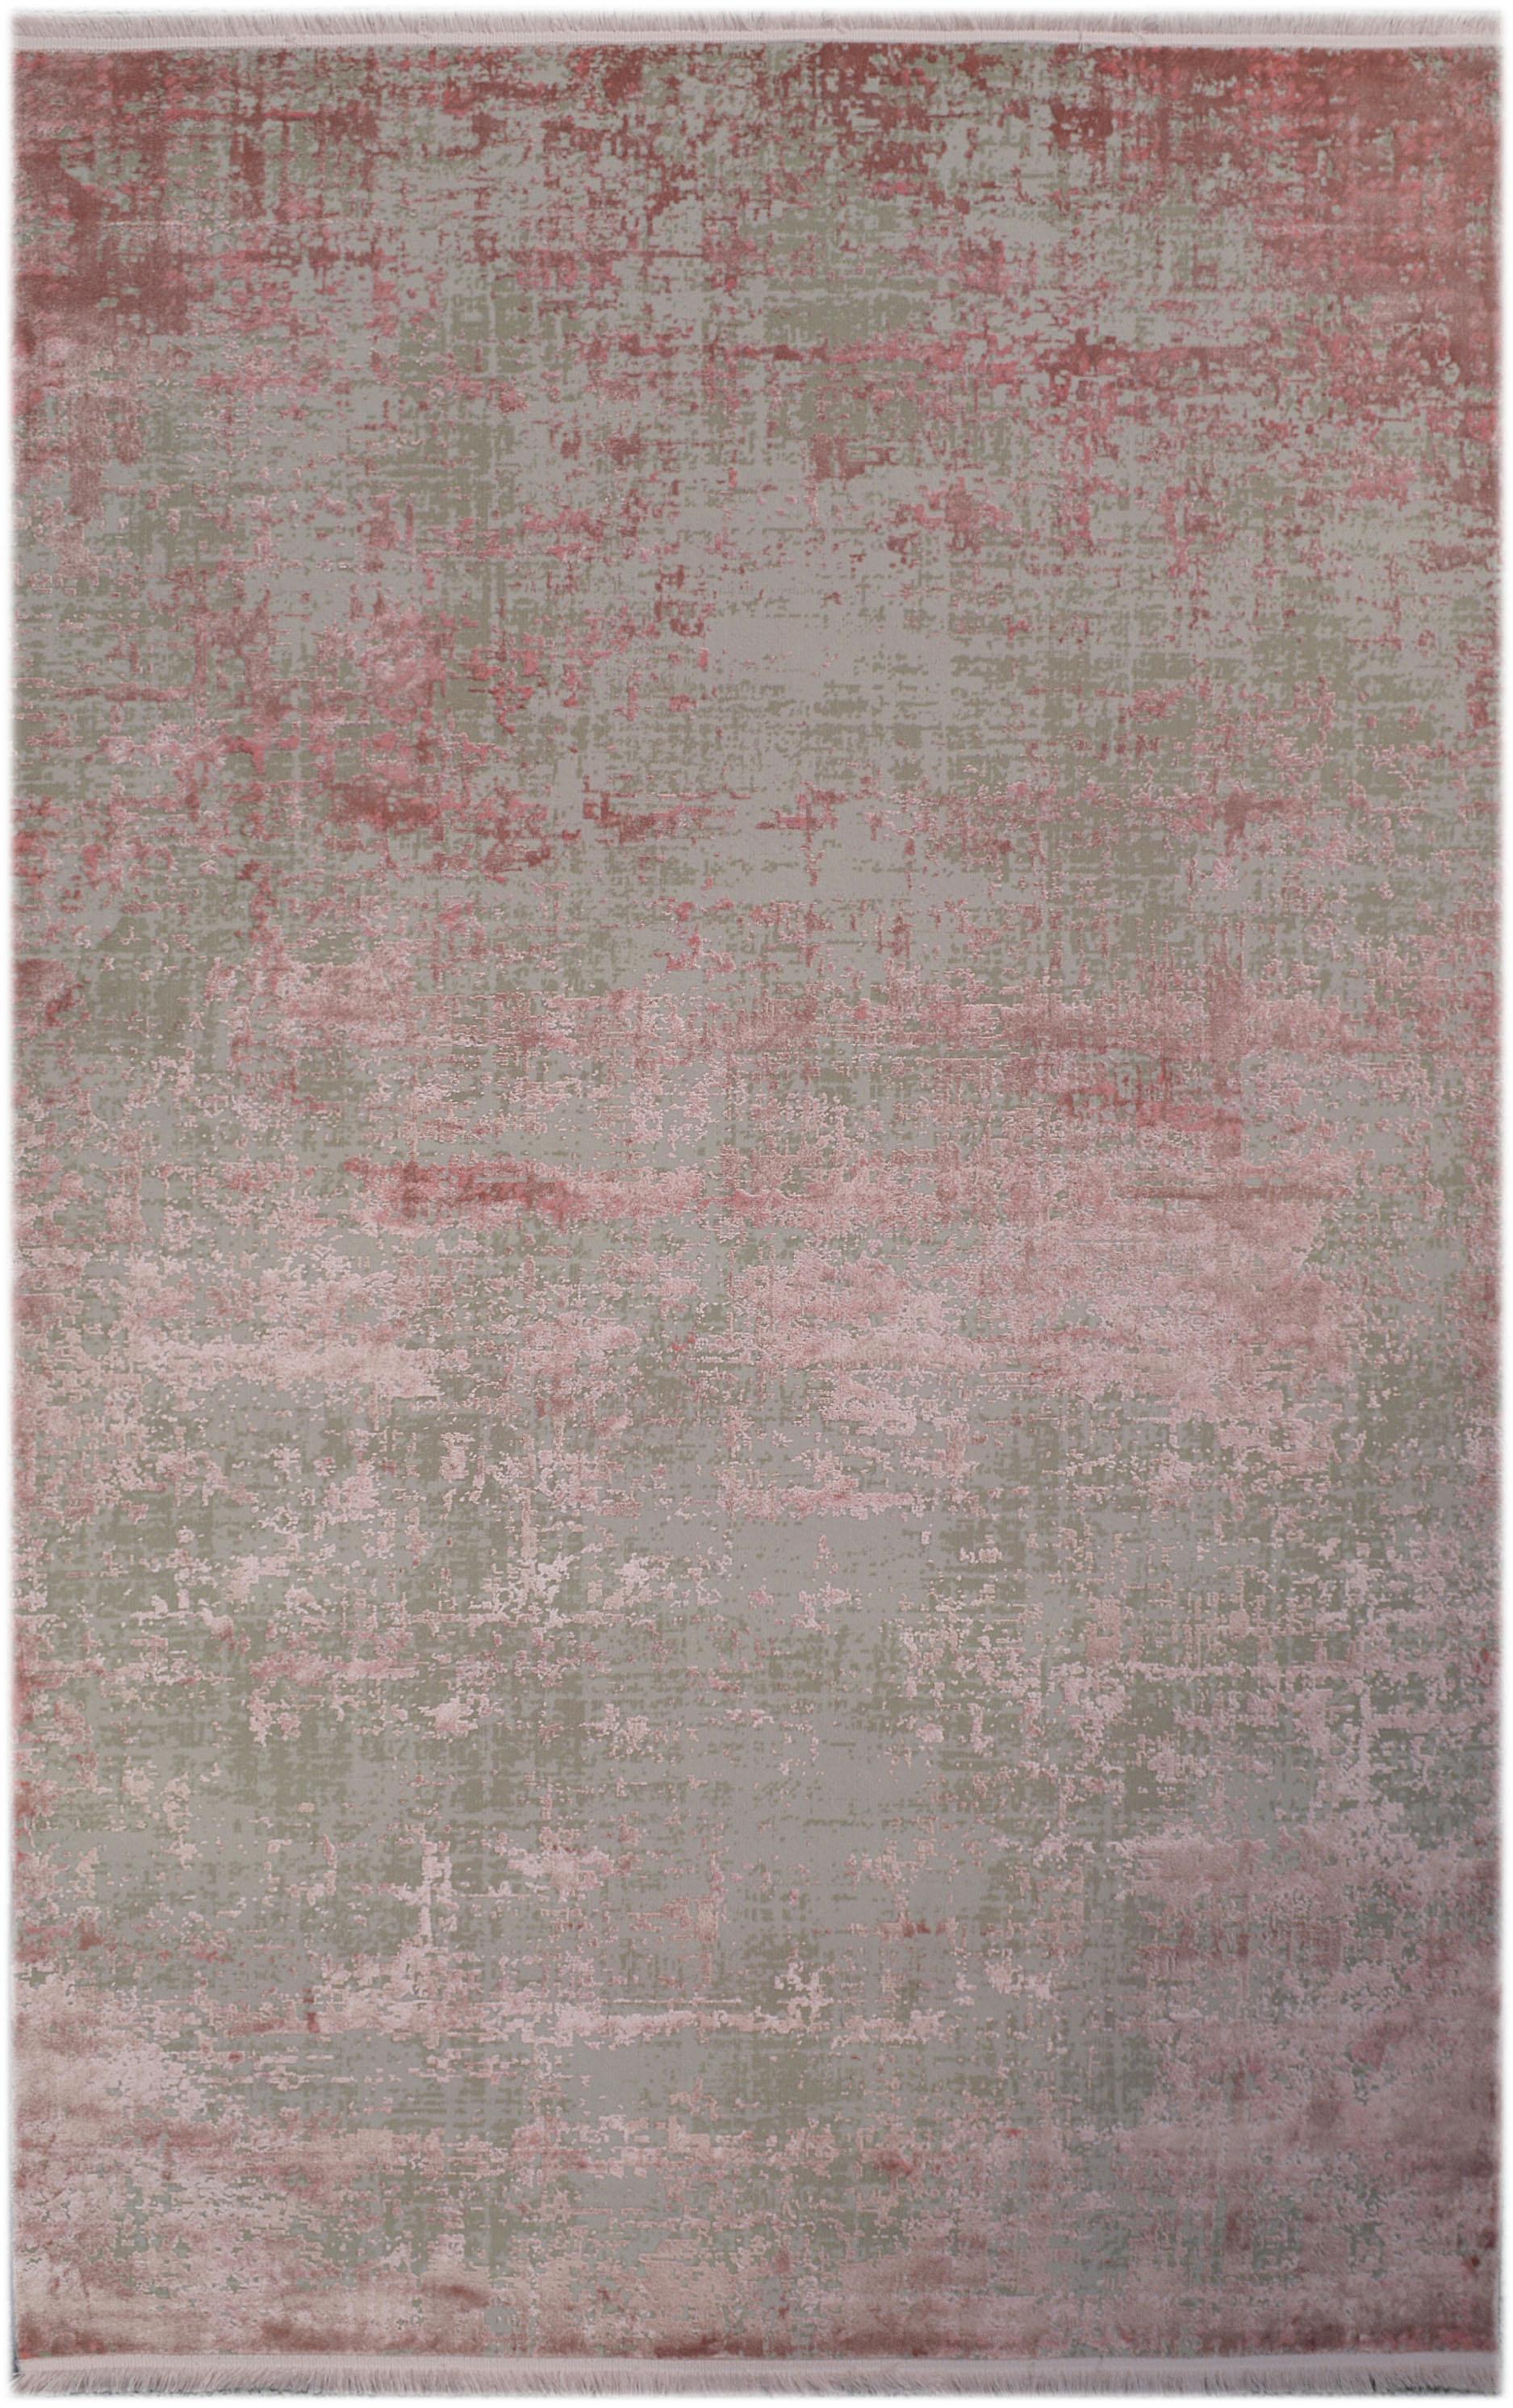 Schimmernder Teppich Cordoba mit Fransen, Vintage Style, Flor: 70% Acryl, 30% Viskose, Grau, Rosatöne, B 130 x L 190 cm (Grösse S)